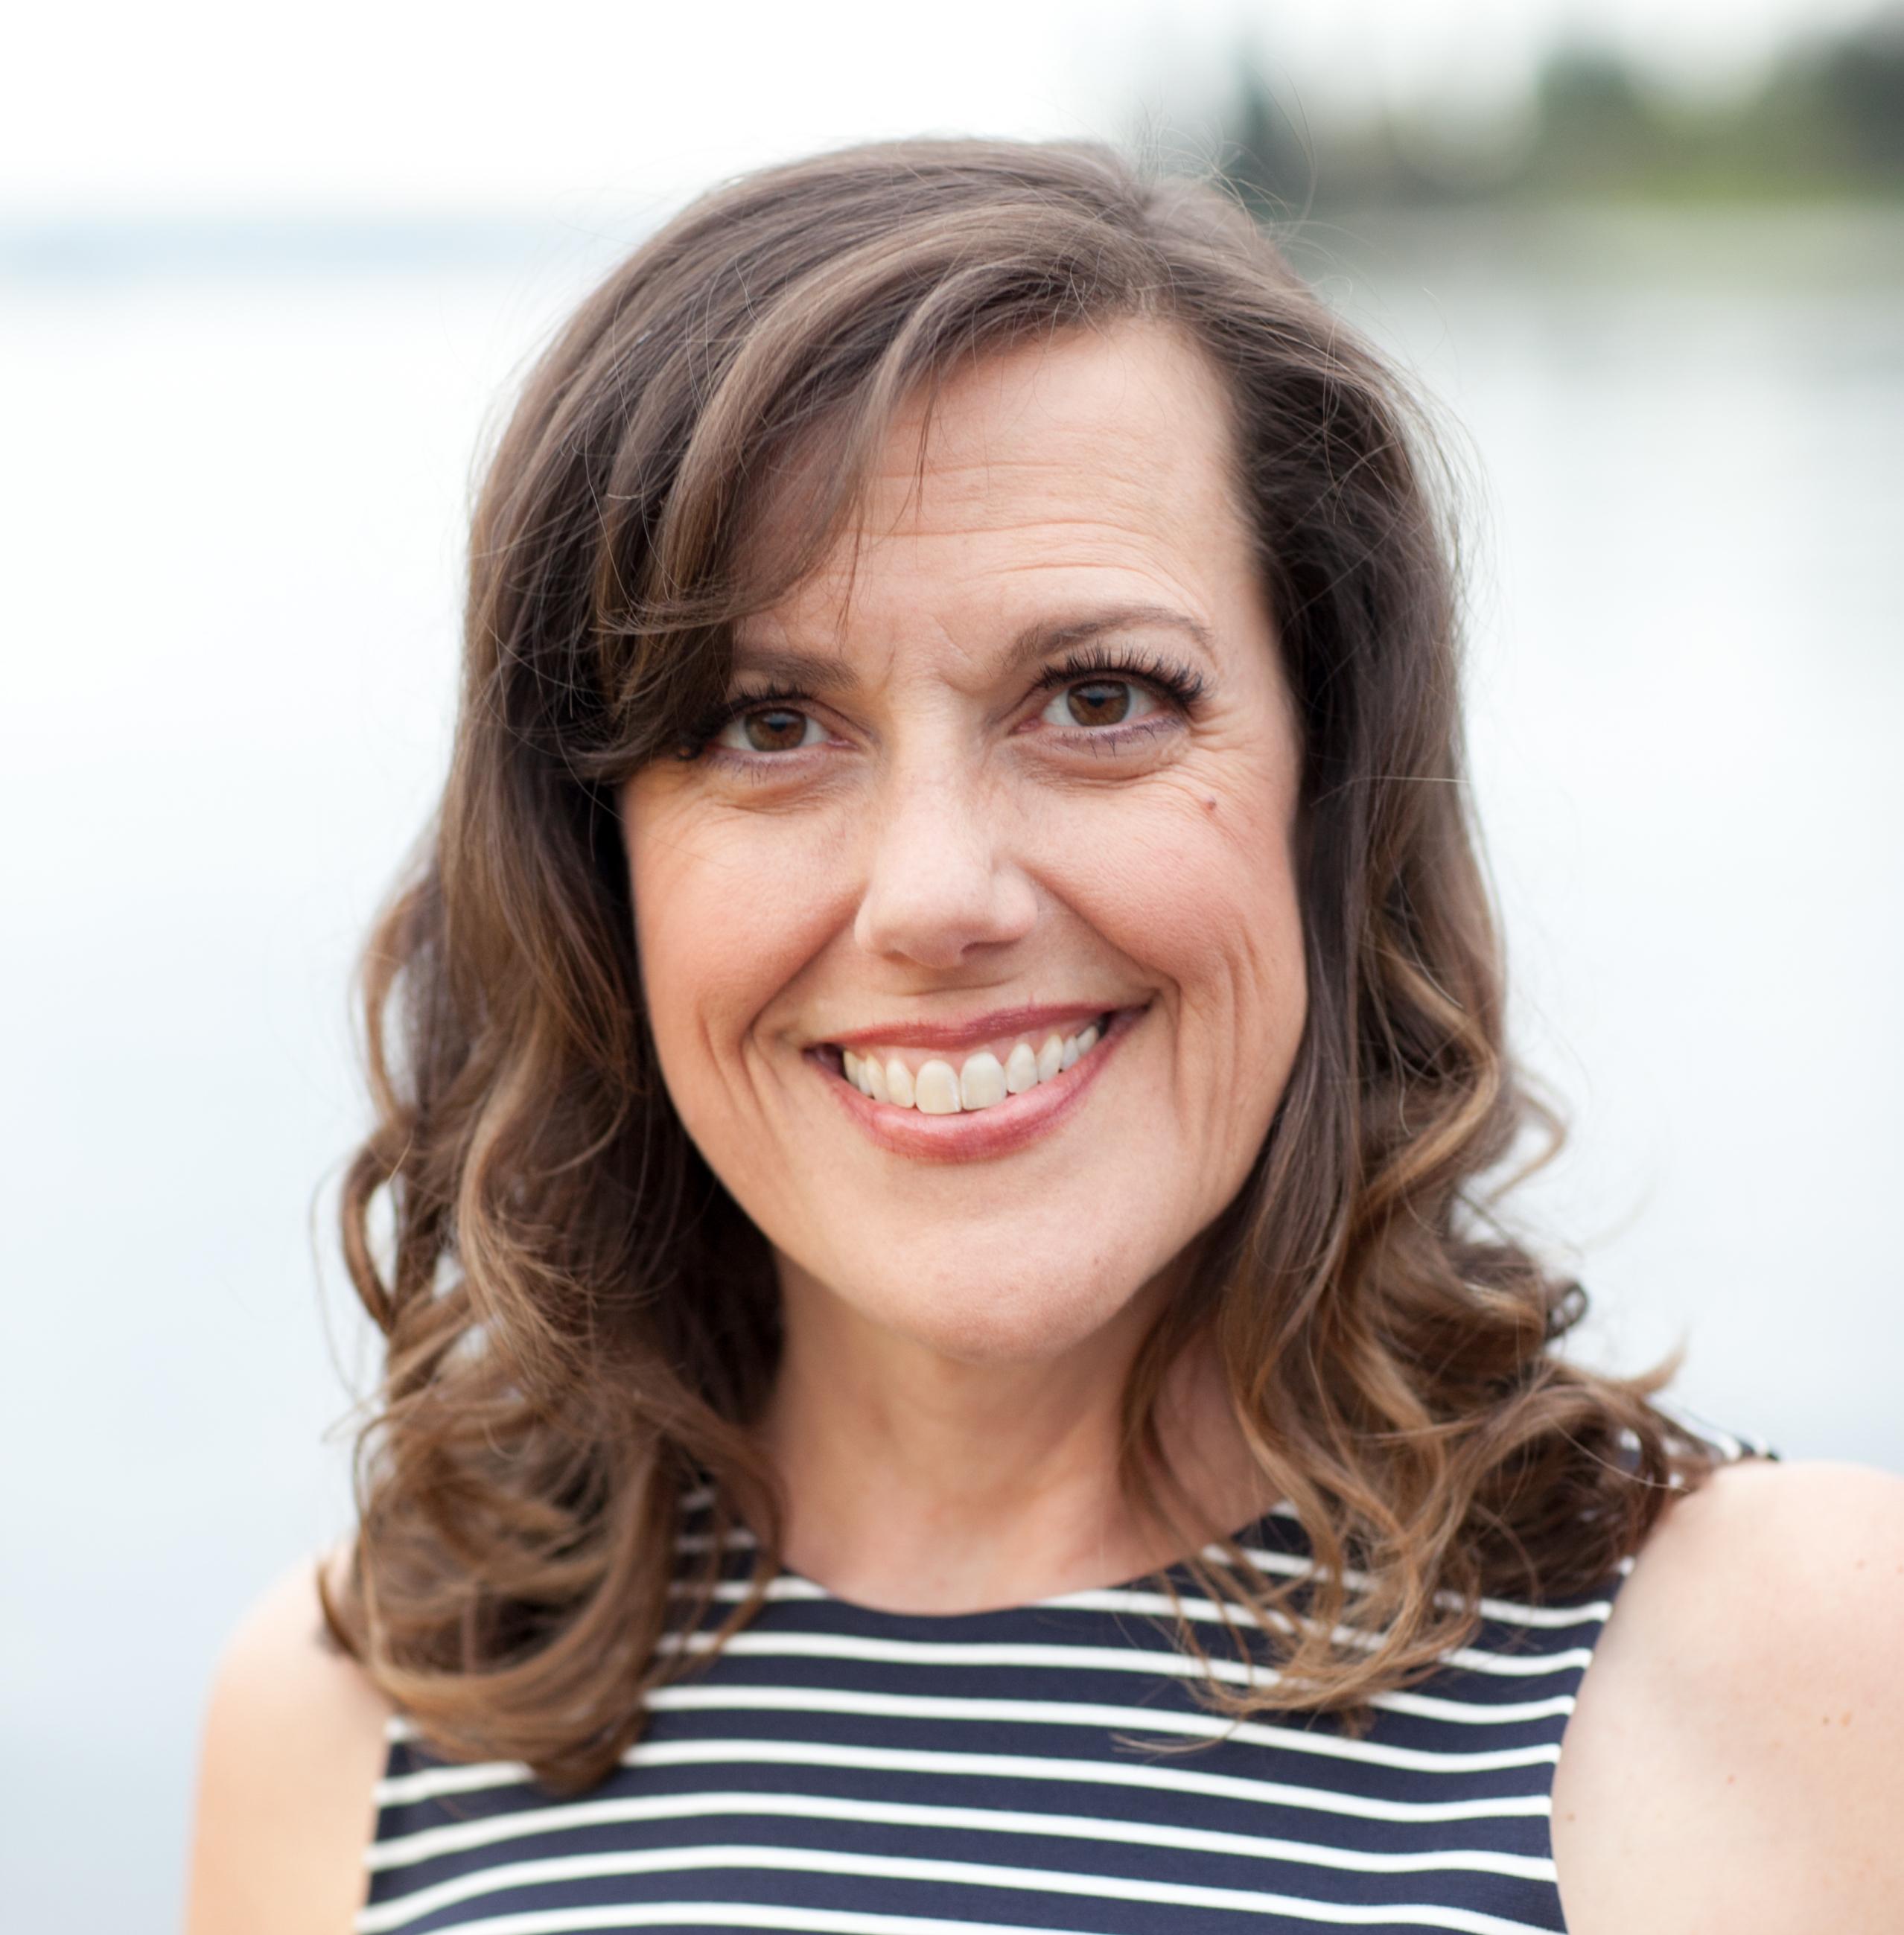 Cheryl Mauer Bainbridge Island Realtor headshot